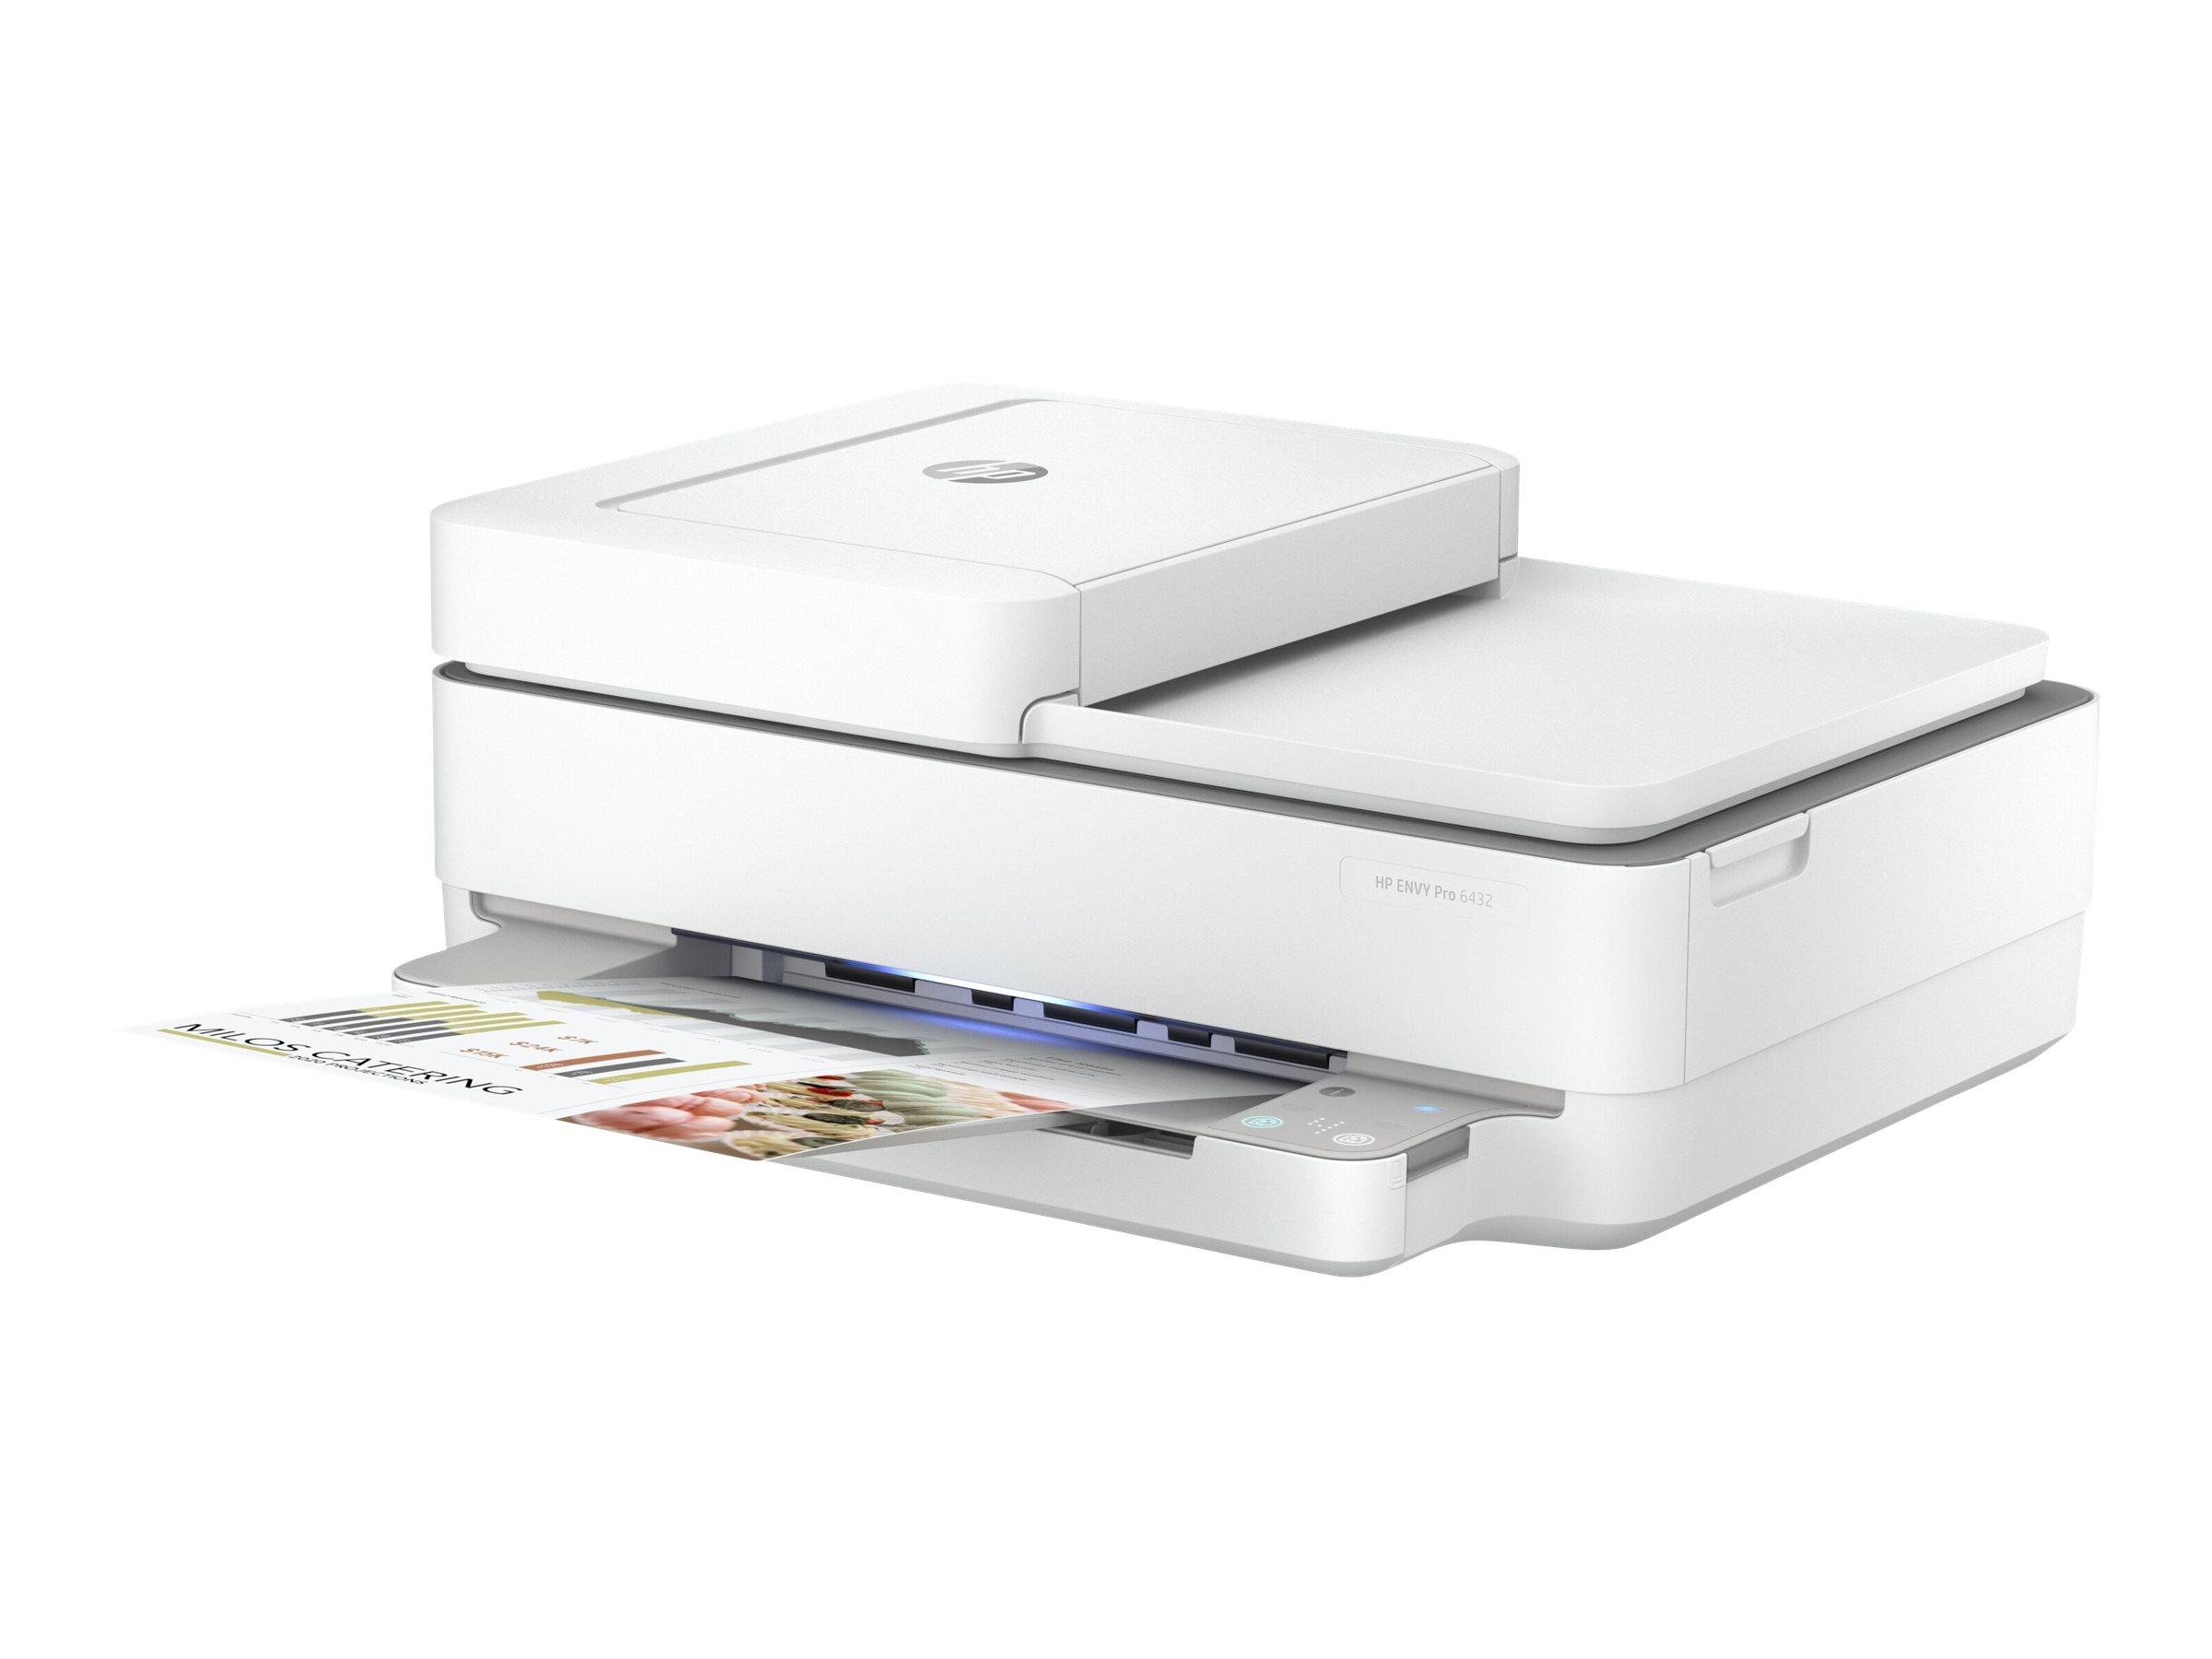 HP ENVY Pro 6432e All-in-One - Multifunktionsdrucker - Farbe - Tintenstrahl - 216 x 297 mm (Original) - A4/Letter (Medien)